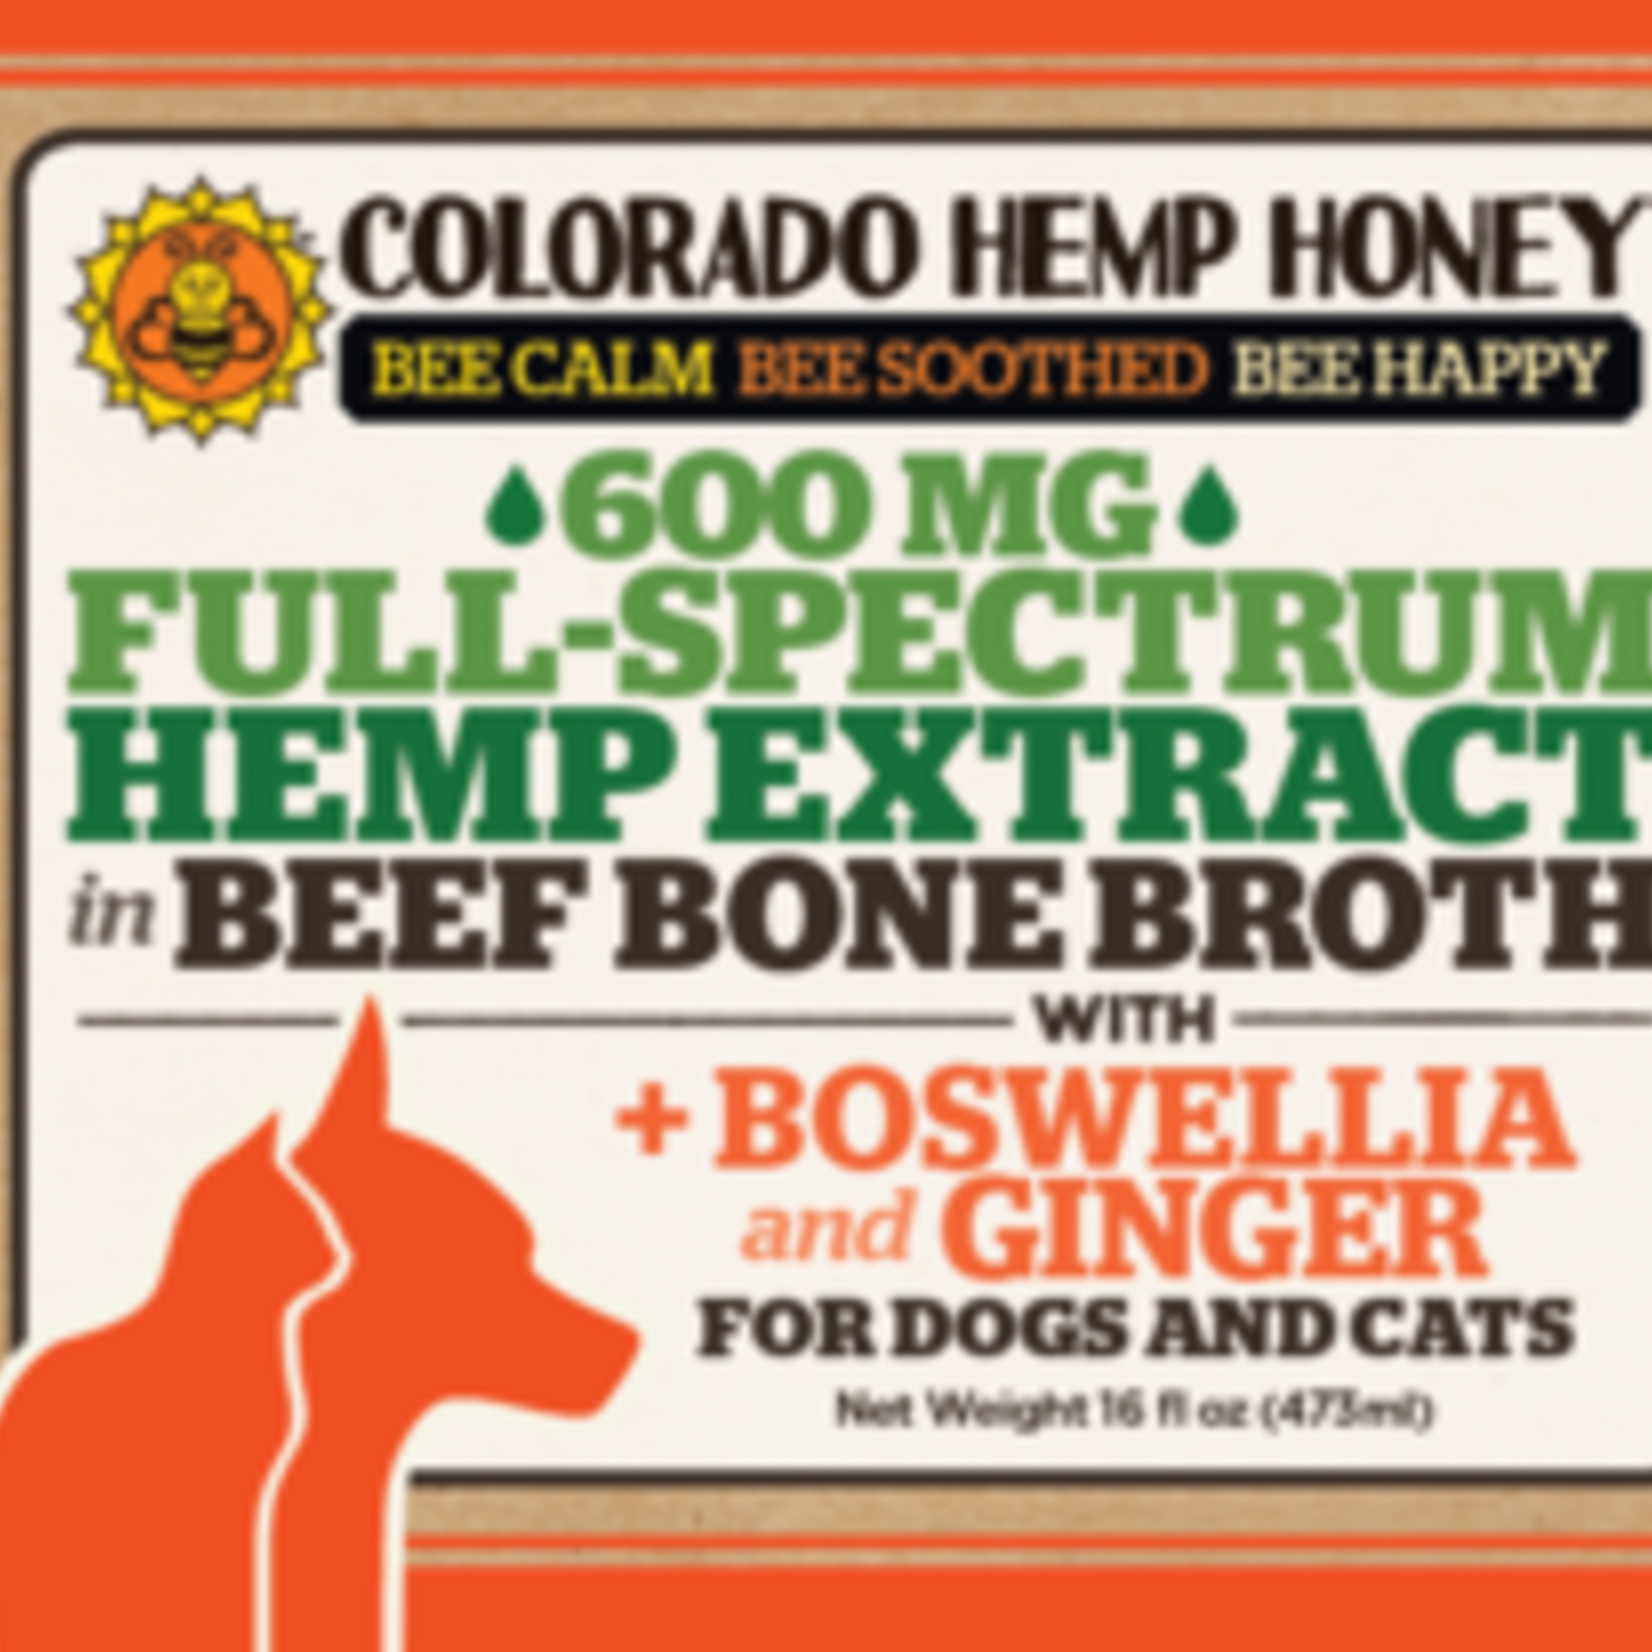 Colorado Hemp Honey Colorado Hemp Full Spectrum 600 MG Beef Bone Broth